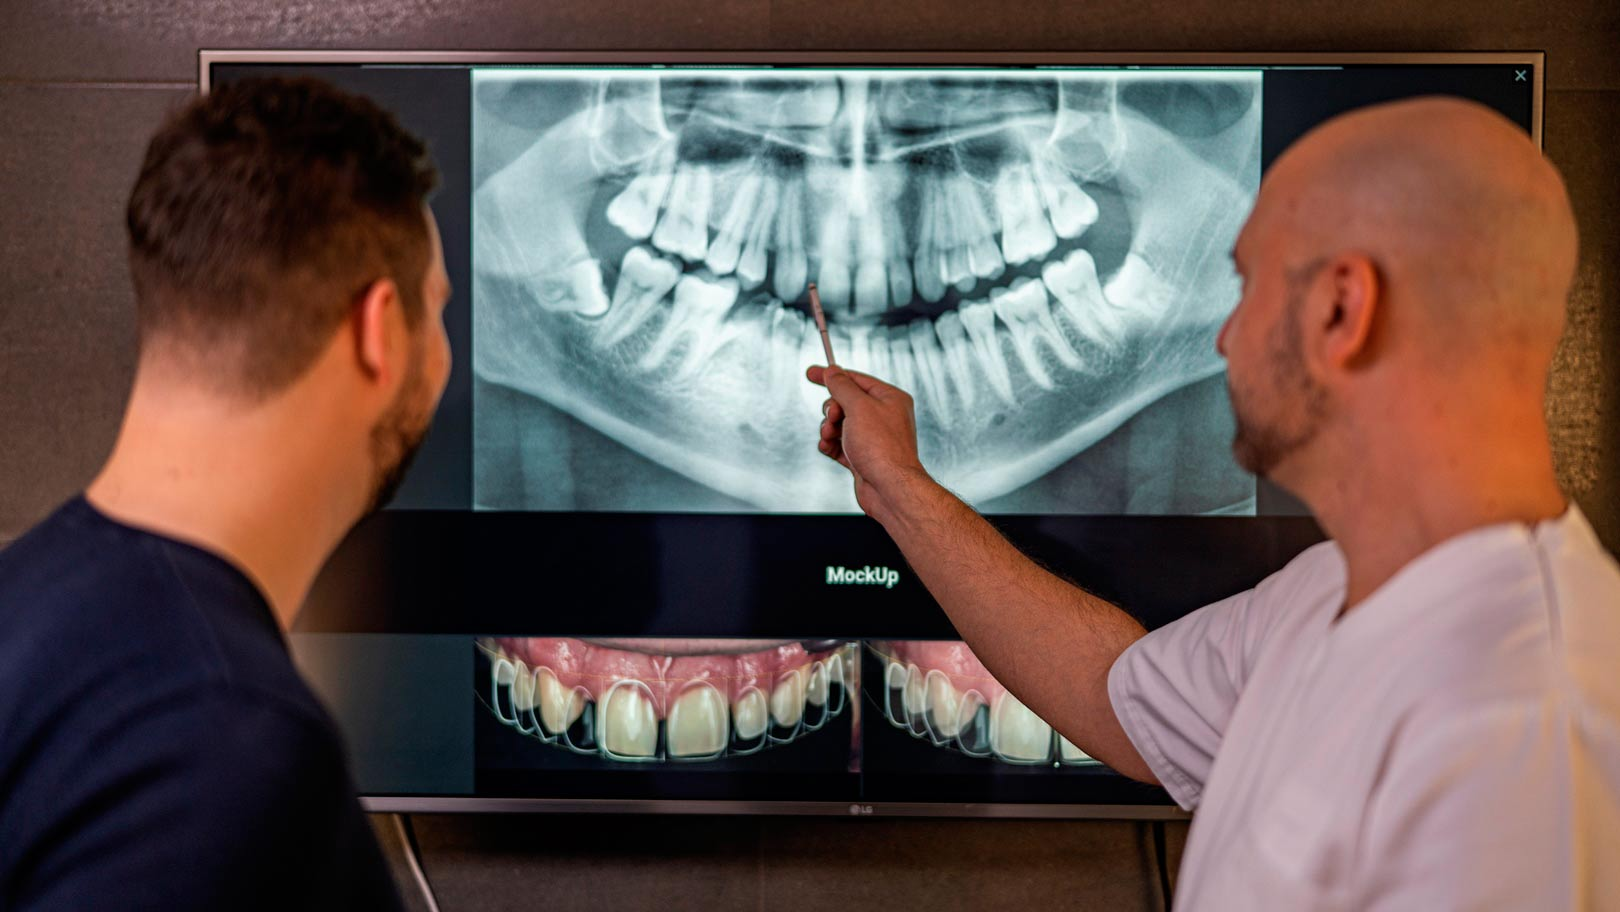 doktor pokazuje snimku ortopana - zubni rentgen